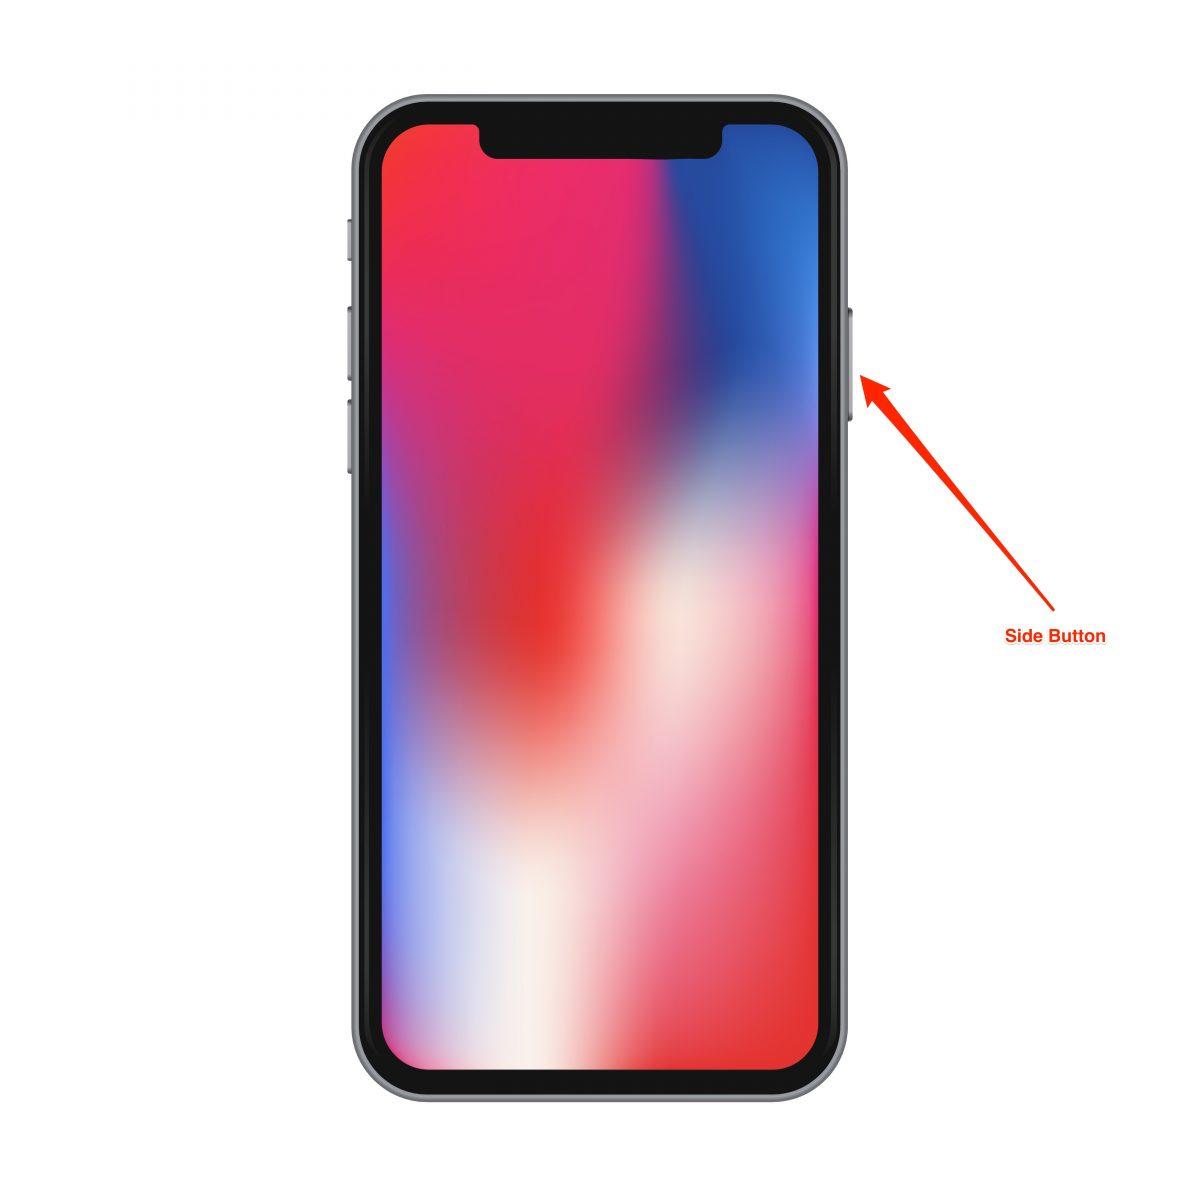 hard reboot the iphone x - step 3